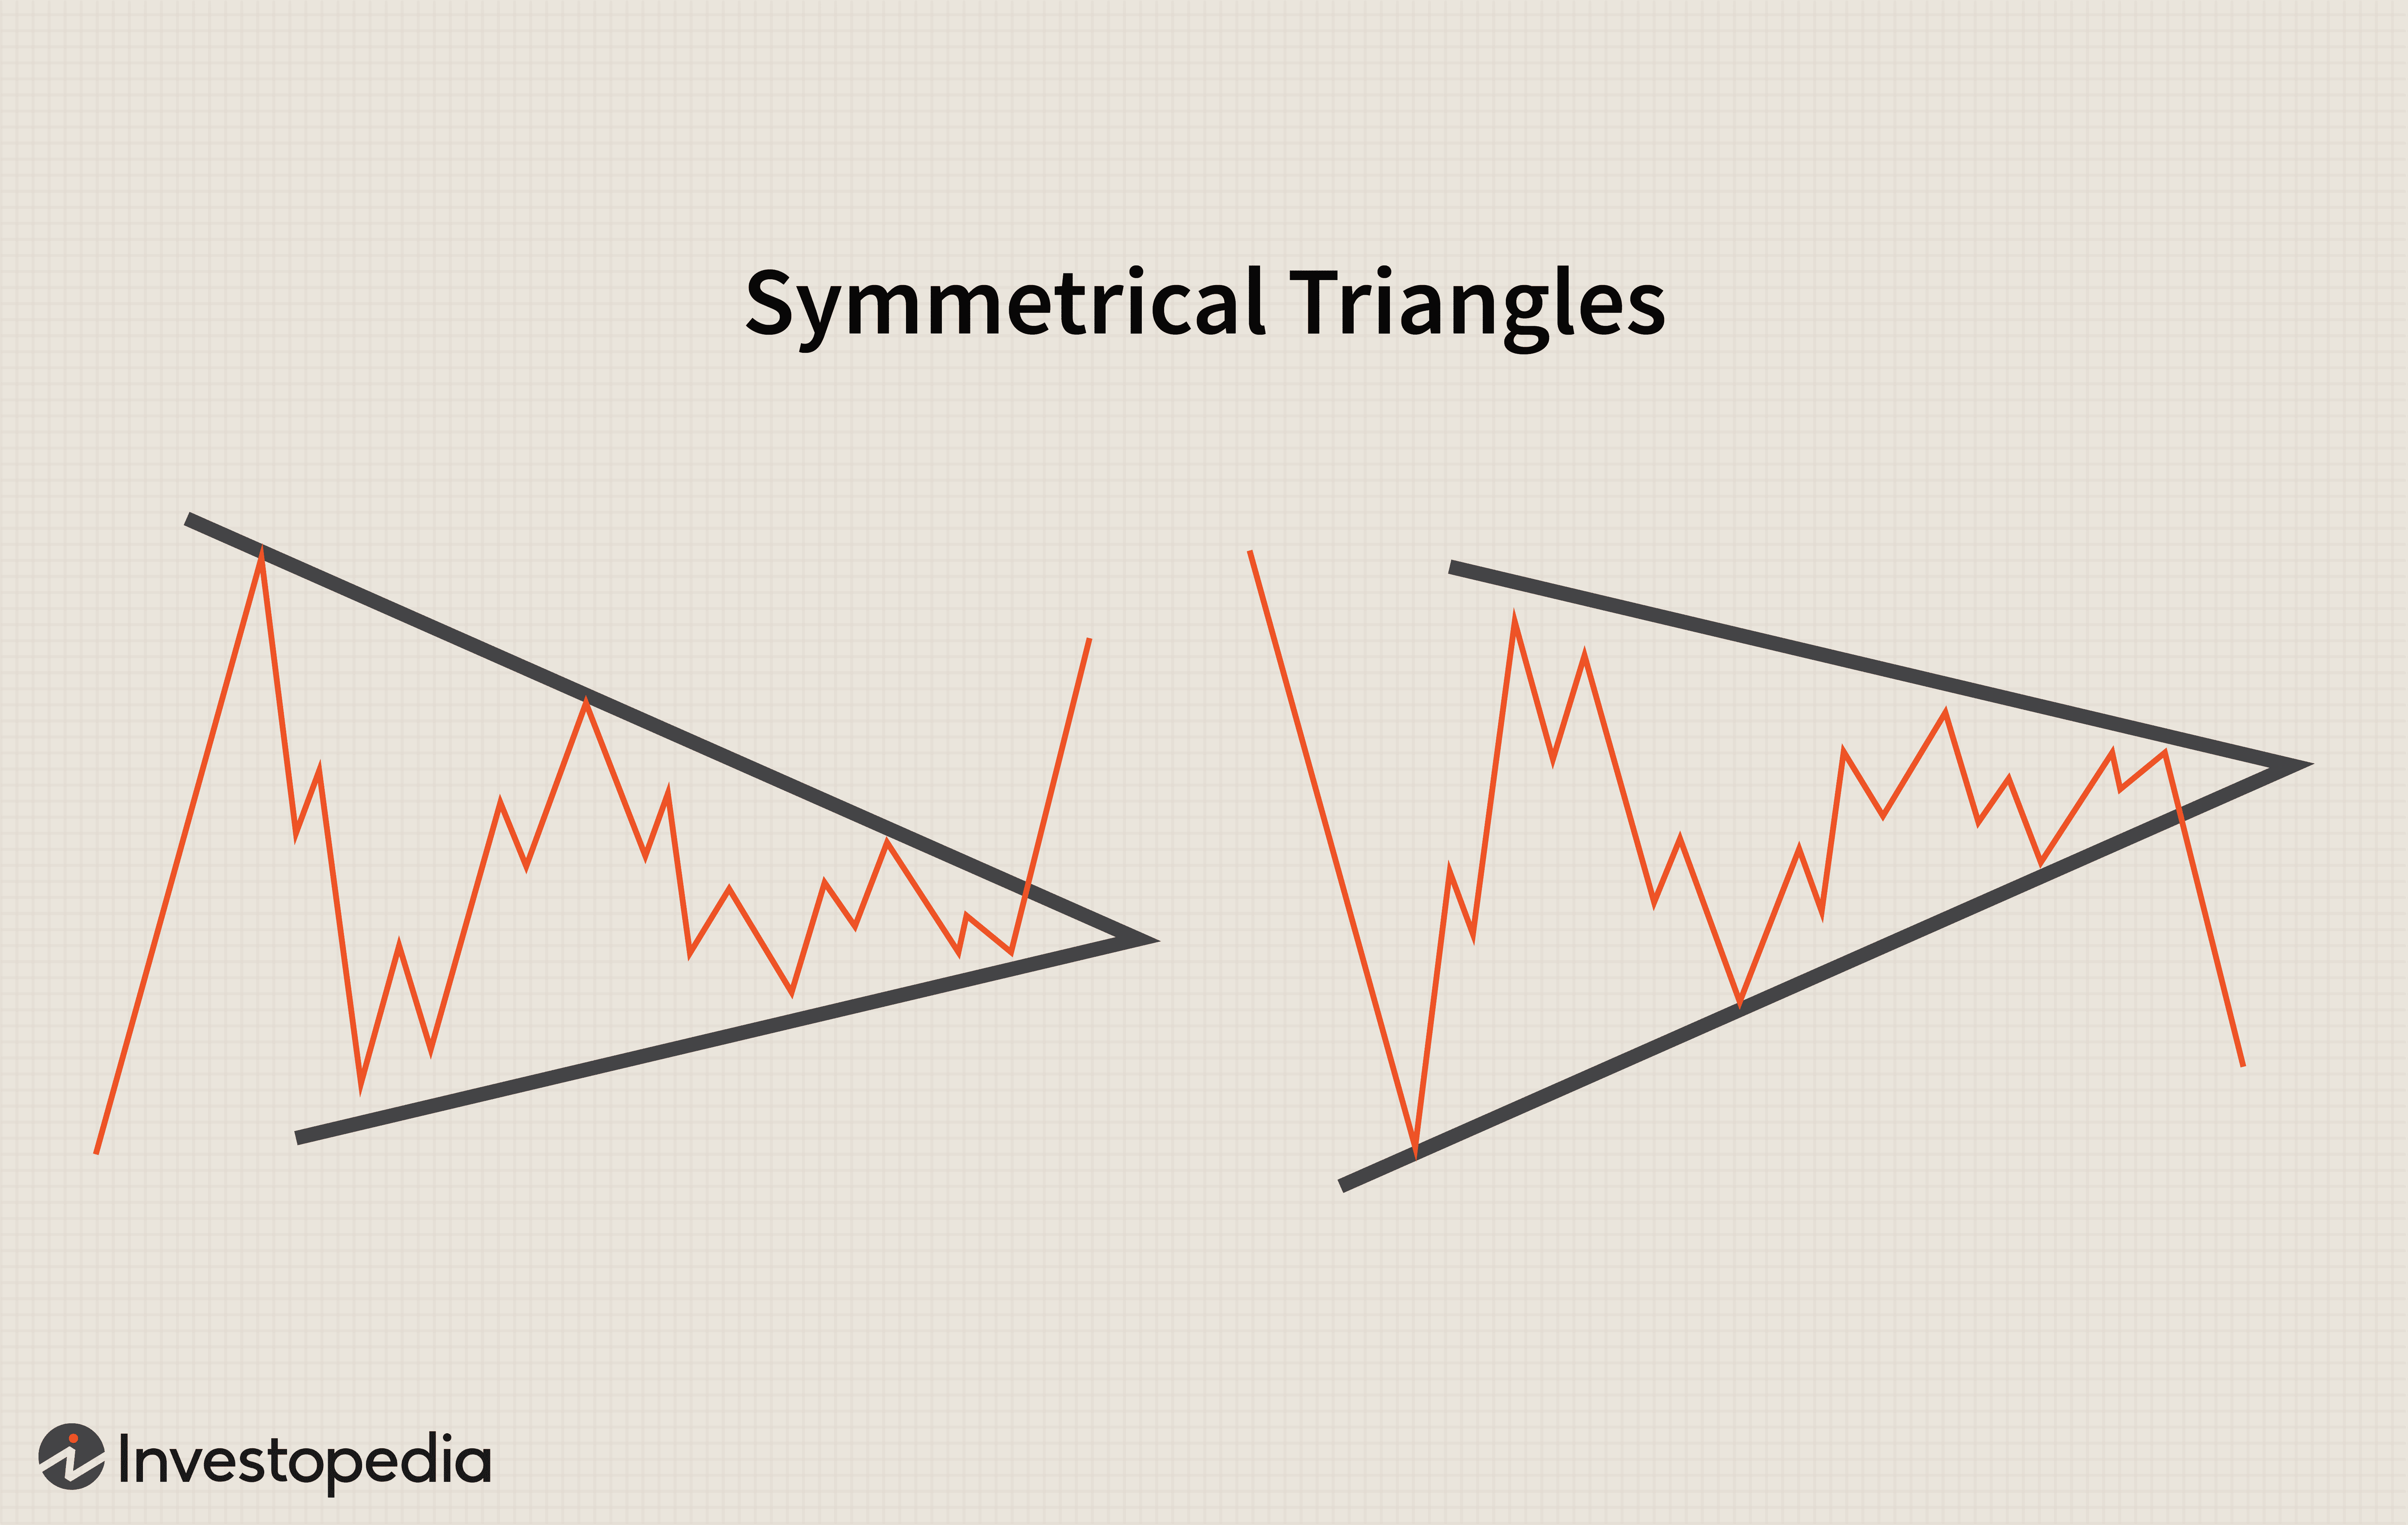 Symmetrical Triangles